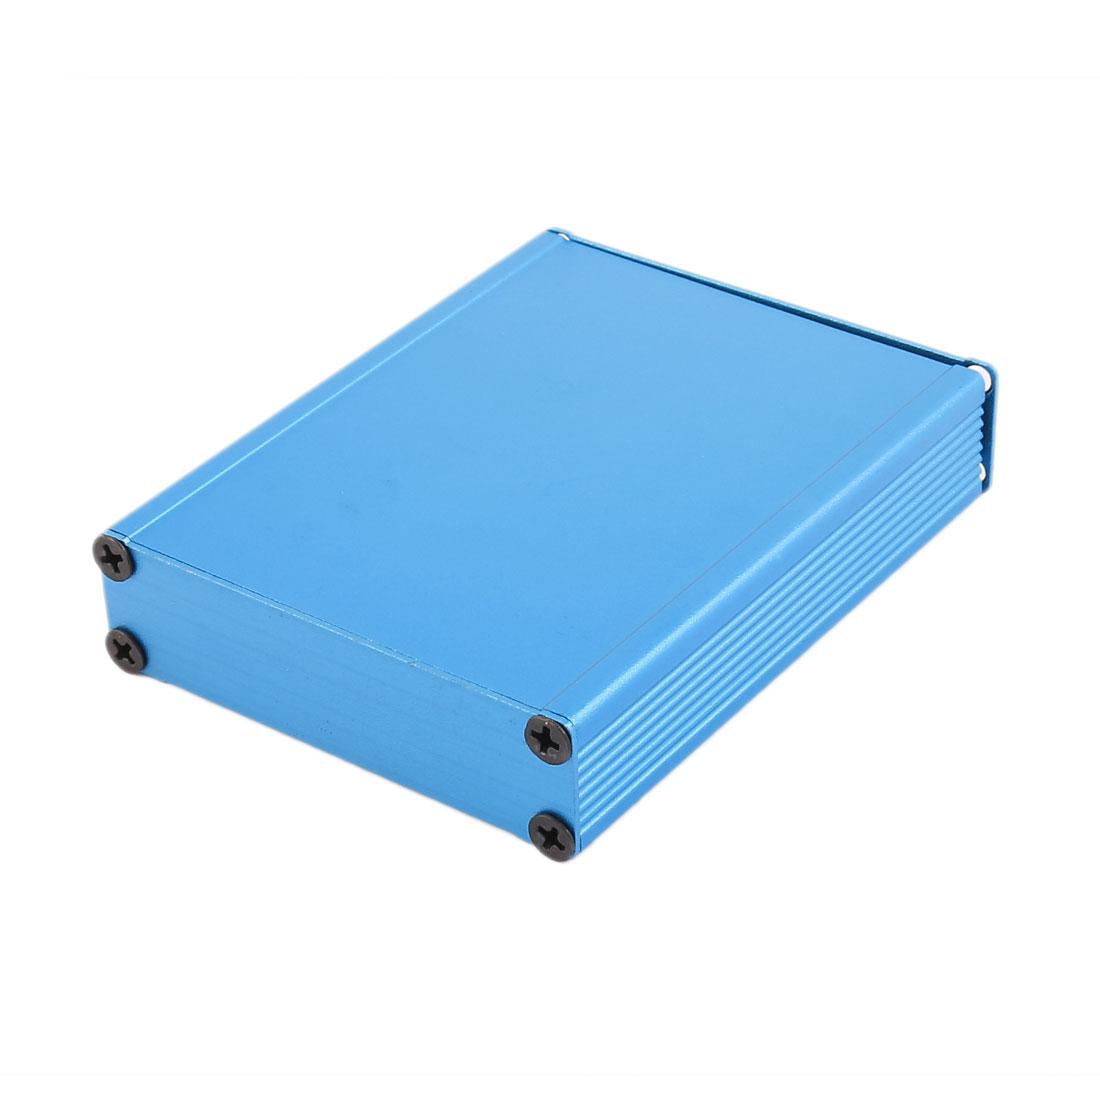 21 x 80 x 100mm Multi-purpose Electronic Extruded Aluminum Enclosure Box Blue